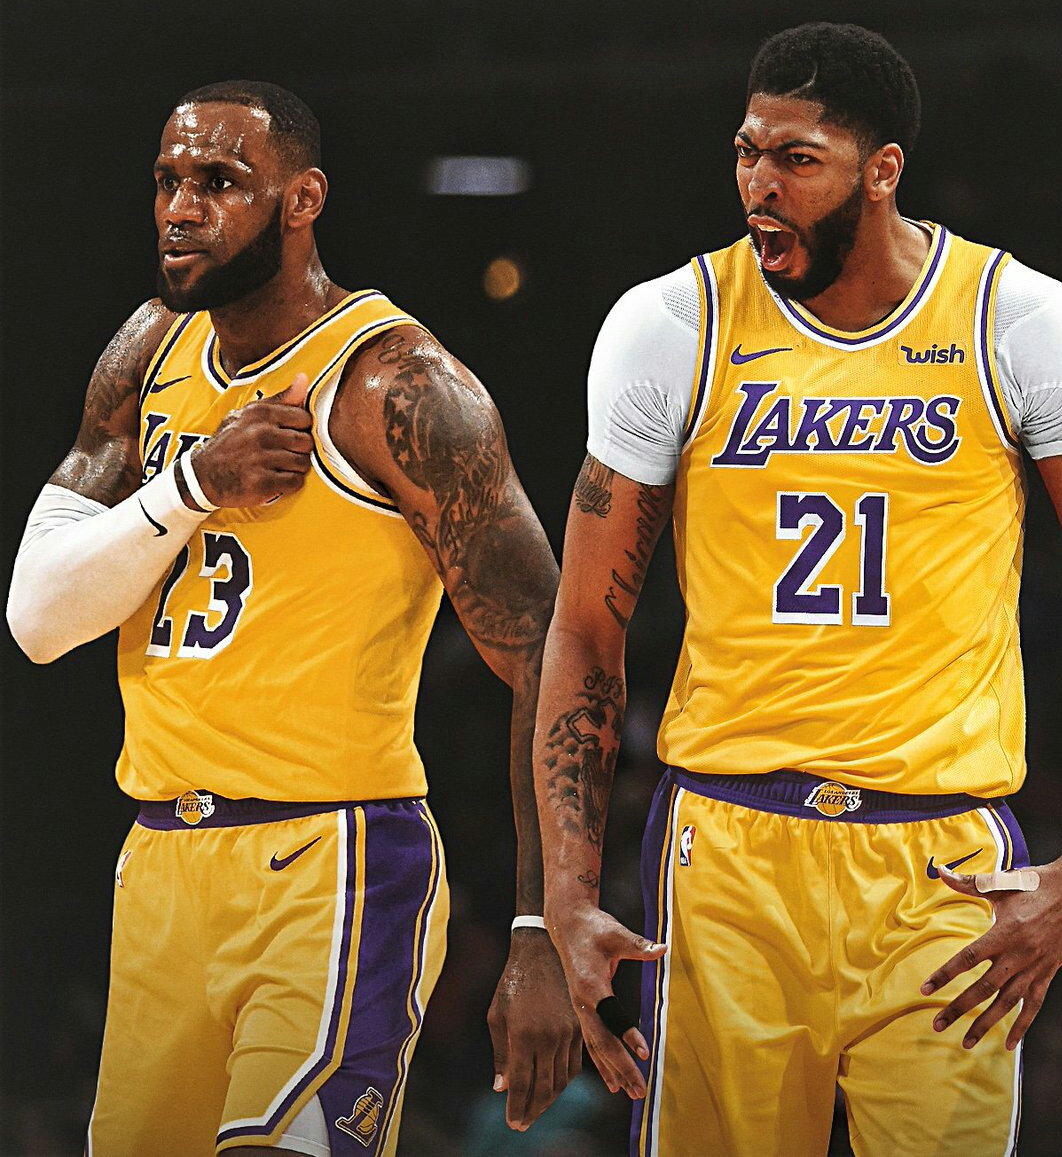 Ставки на баскетбол, Ставки на спорт